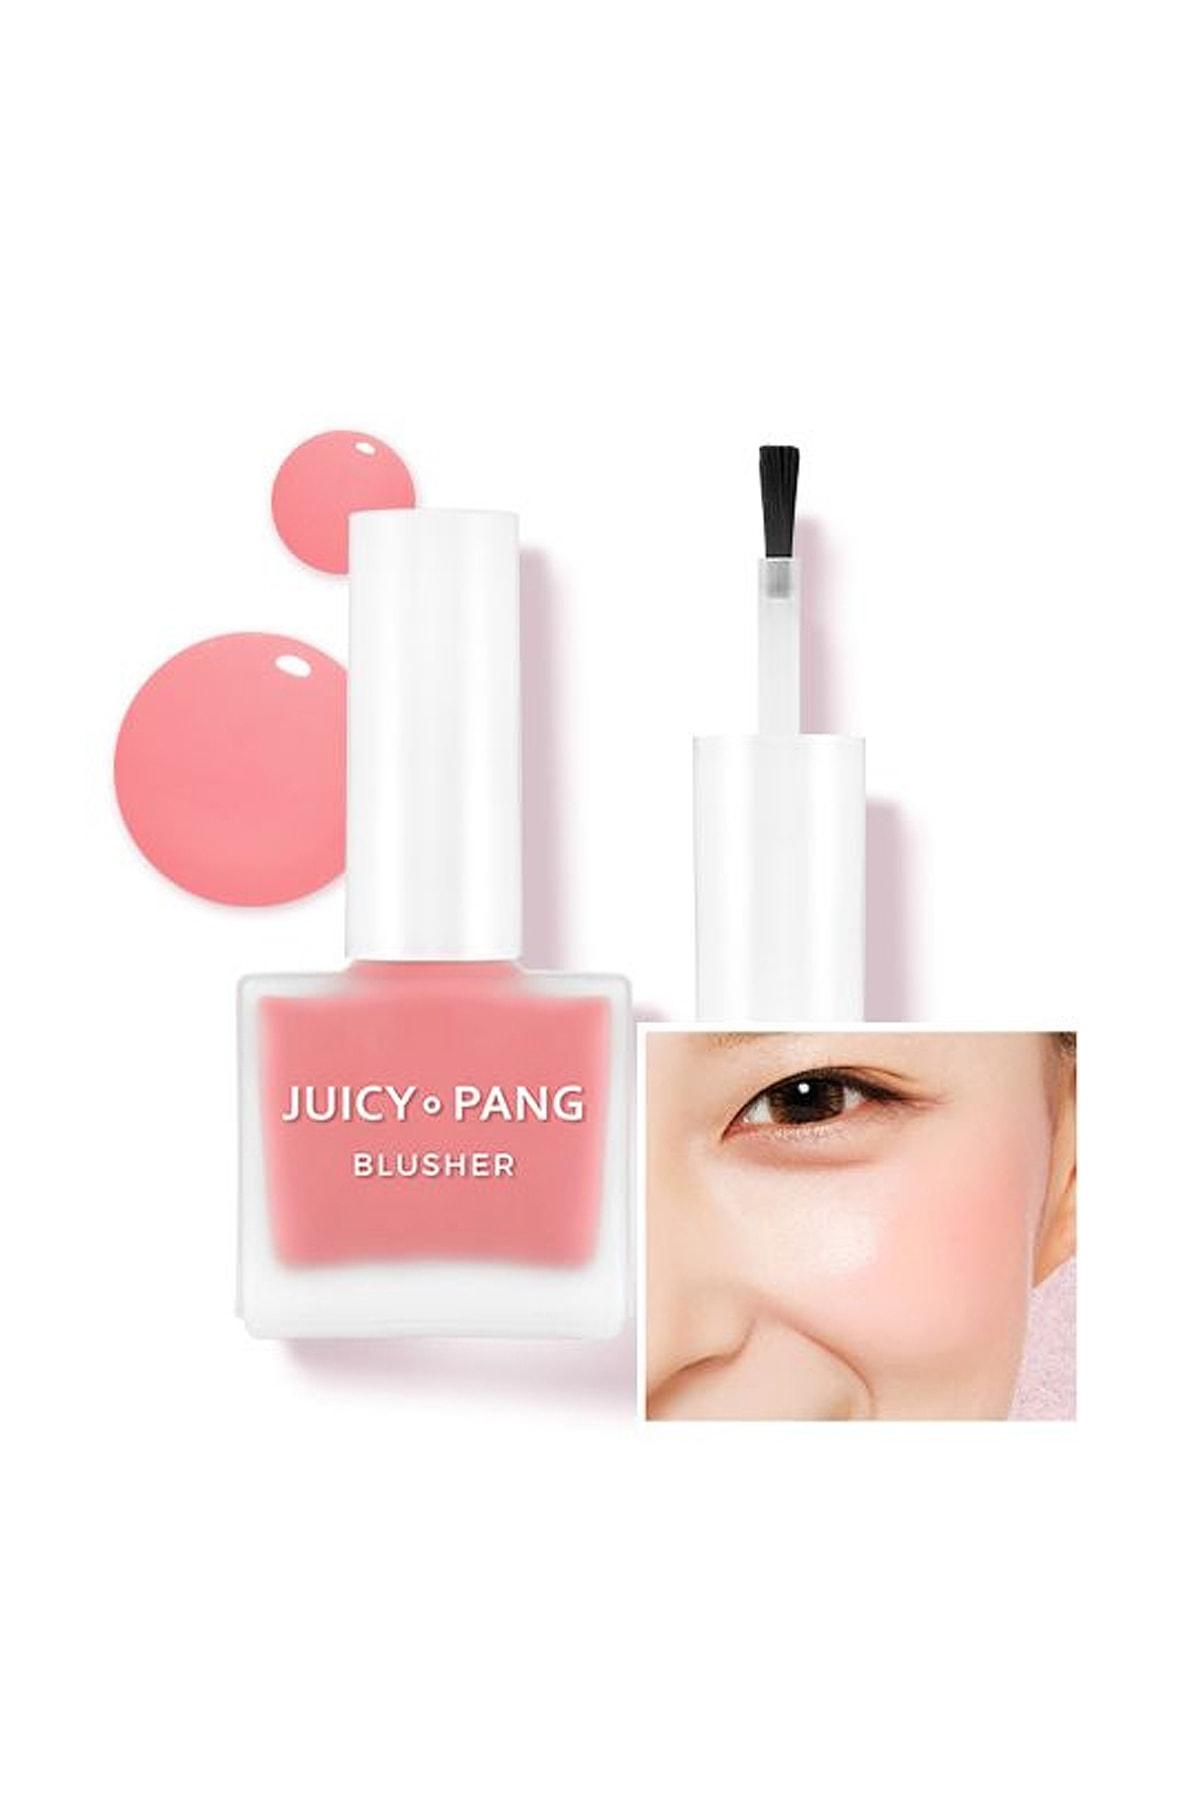 Missha Doğal Görünüm Sunan Nemlendirici Likit Allık 9g. APIEU Juicy-Pang Water Blusher (PK01) 0